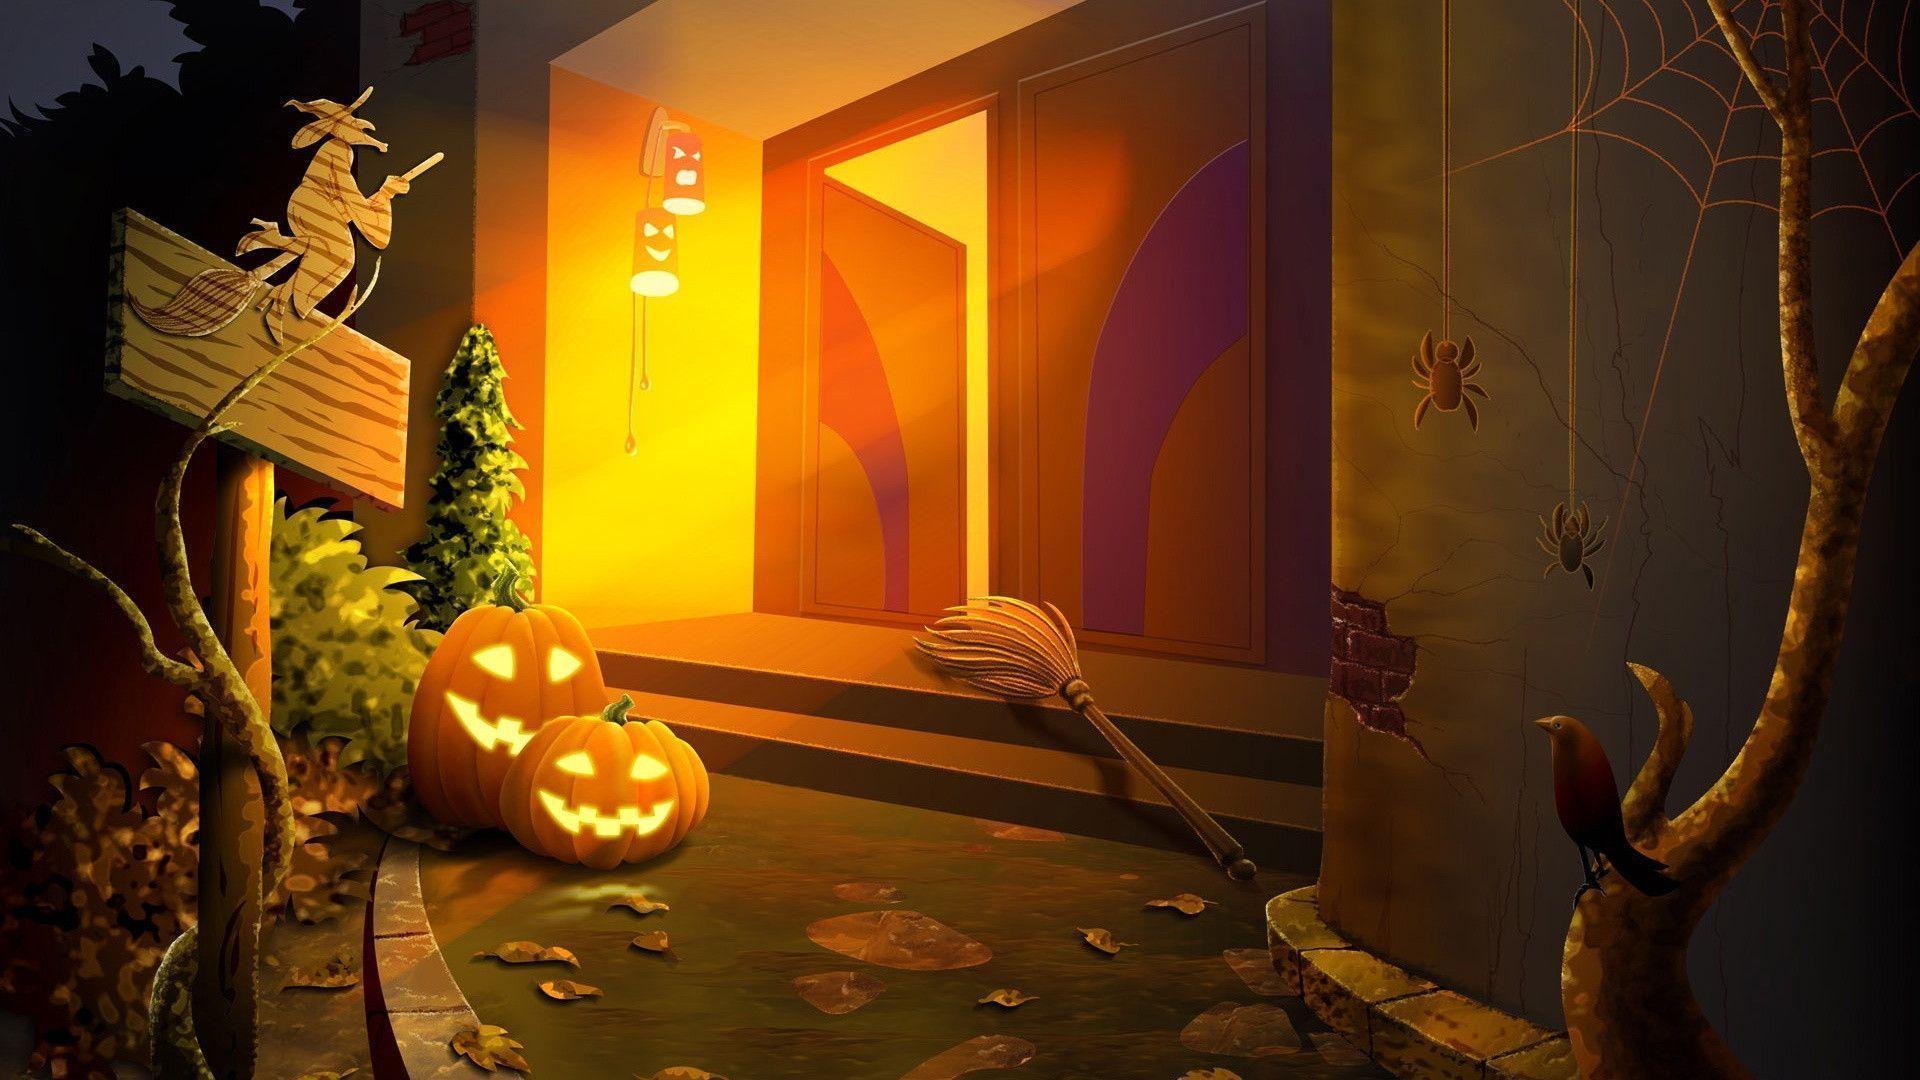 Halloween Pictures Wallpapers - Wallpaper Cave